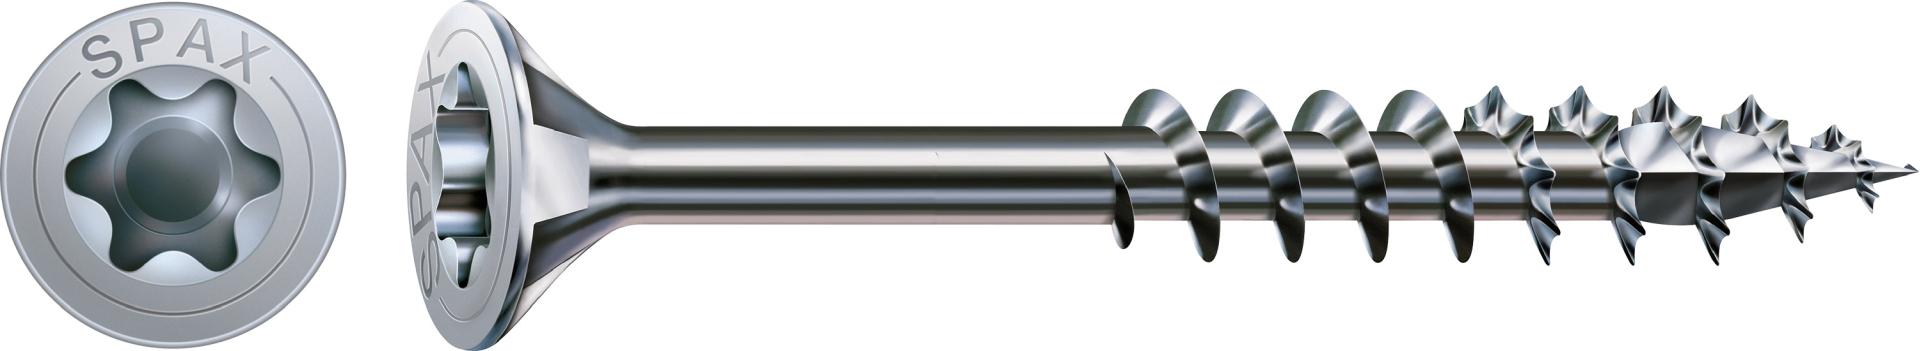 SPAX Universalschraube, Teilgewinde, Senkkopf, T-STAR plus T30, 4CUT, WIROX, 6 x 80 mm, 200 Stück